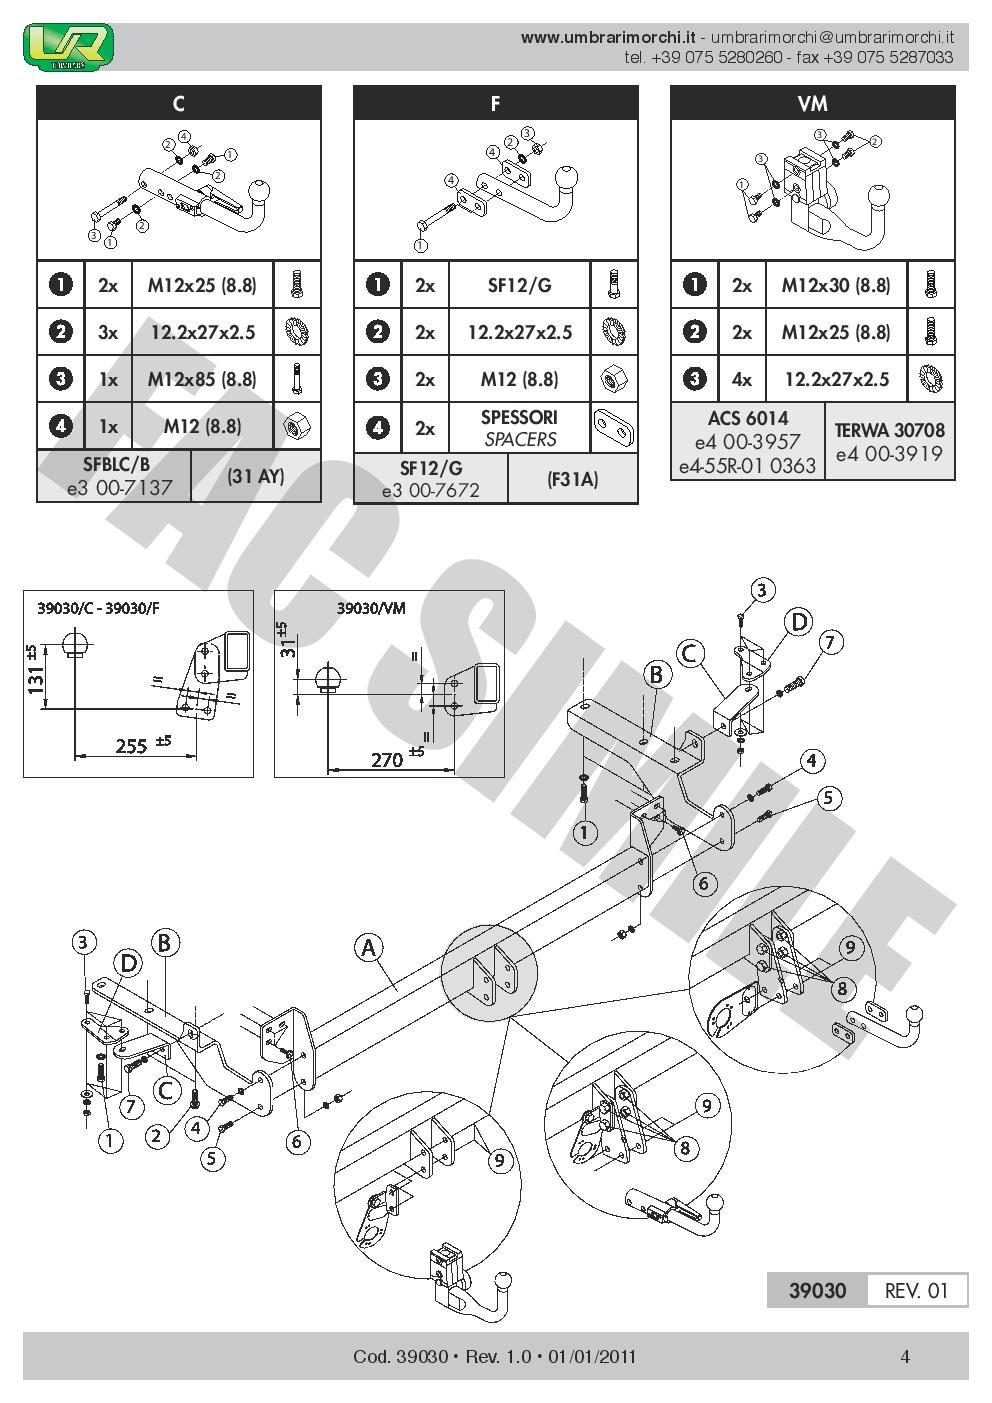 Attelage Col Cygne Faisceaux 7 Br pour Toyota RAV4 III 5p 4WD 06-08 39030//F/_B1